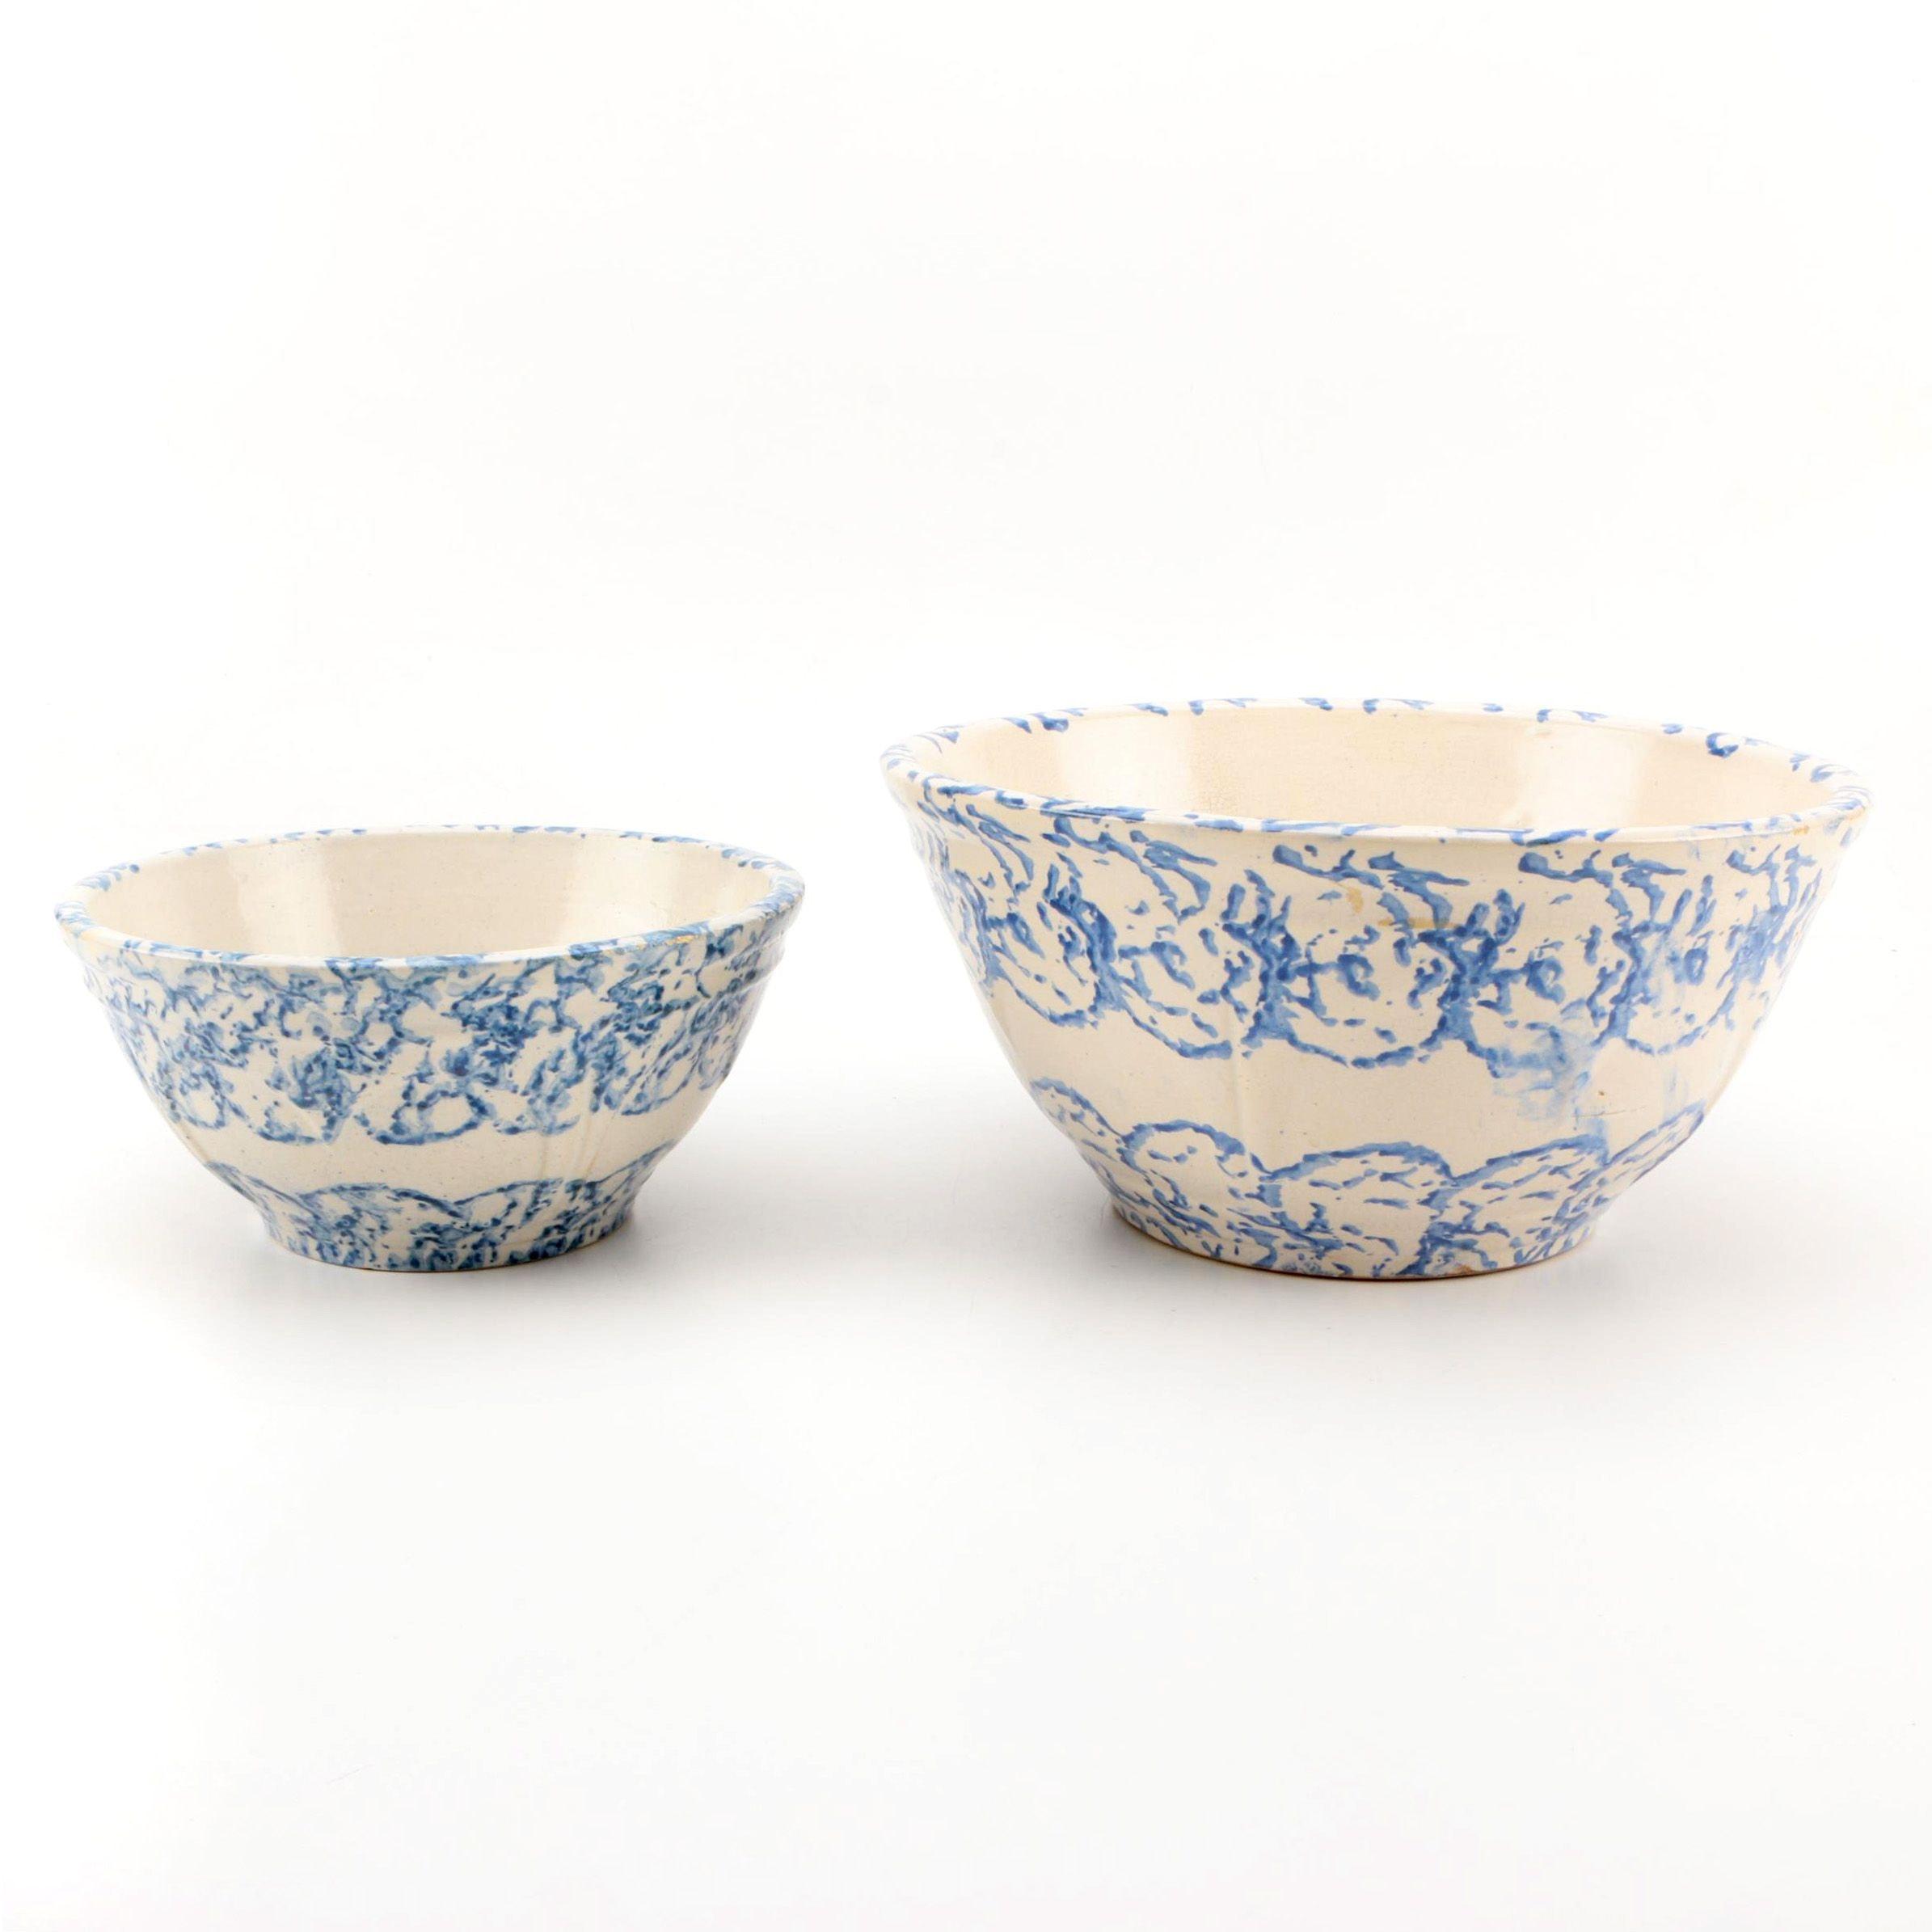 Vintage Spongeware Stoneware Bowls